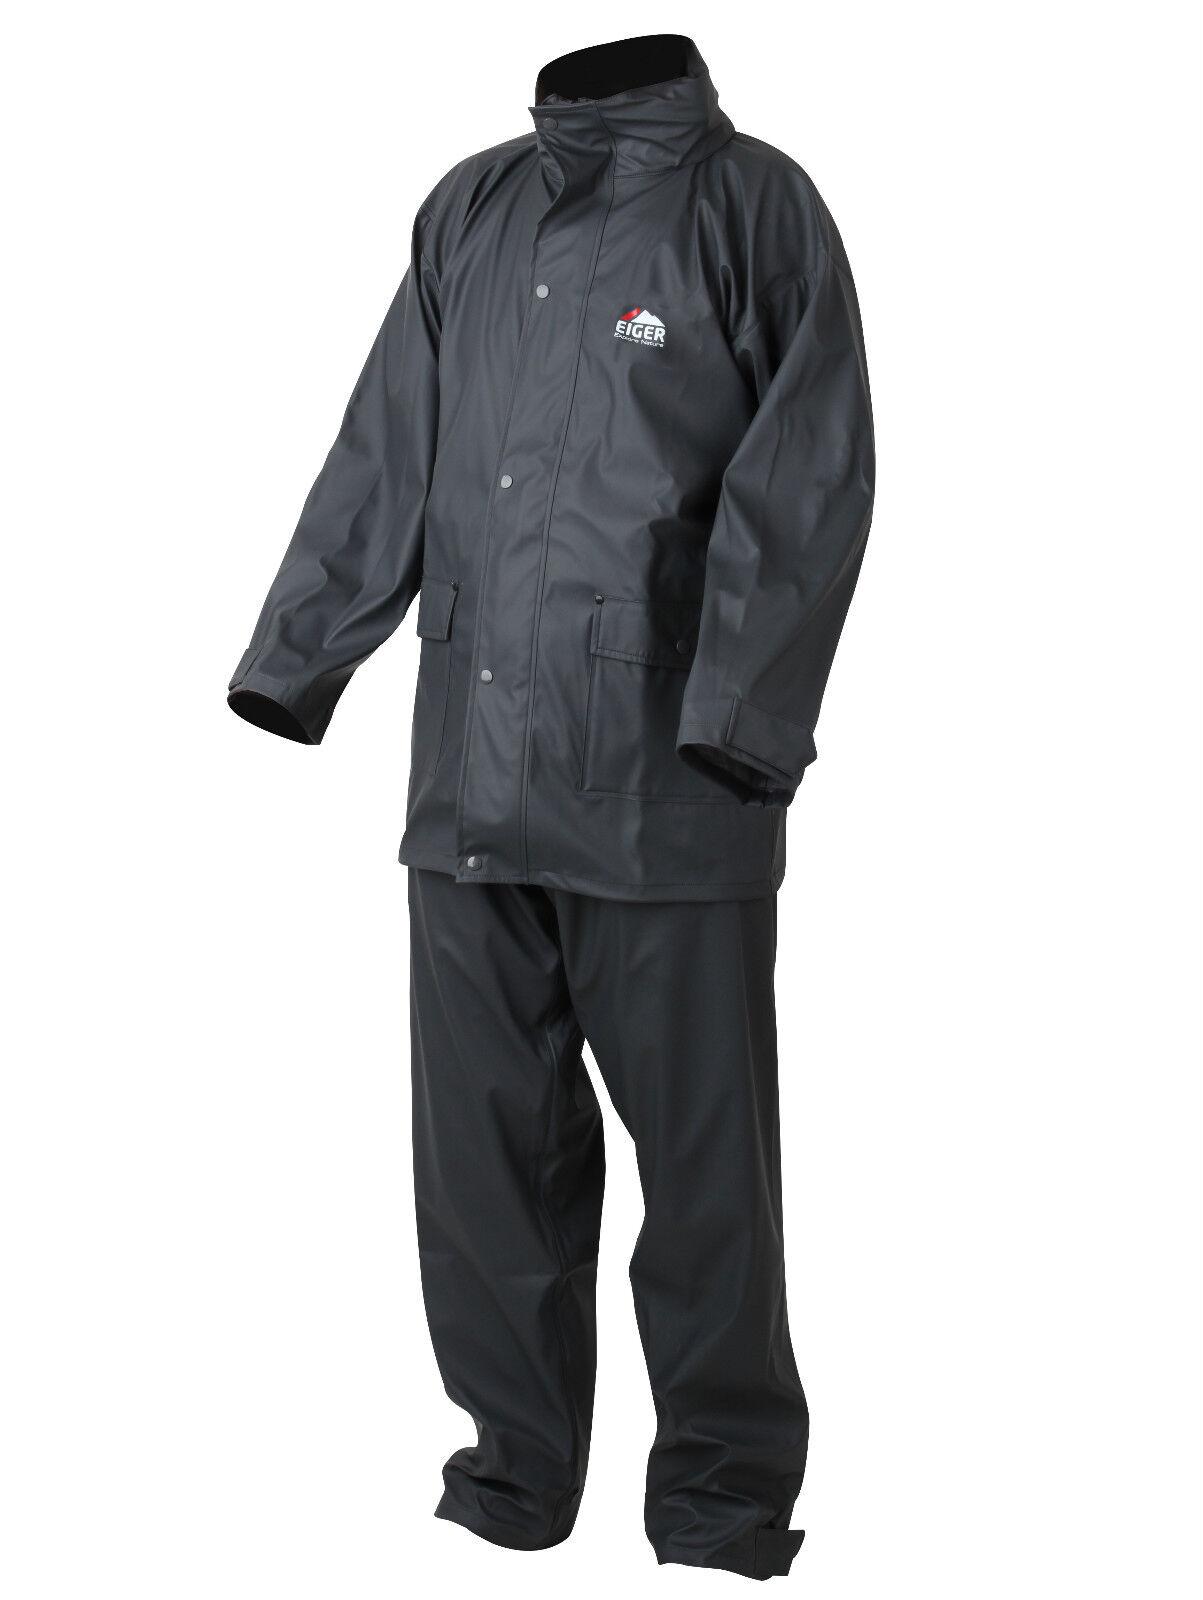 Eiger RAINY Set dimensioni scelta Tuta da pioggia Giacca impermeabile &